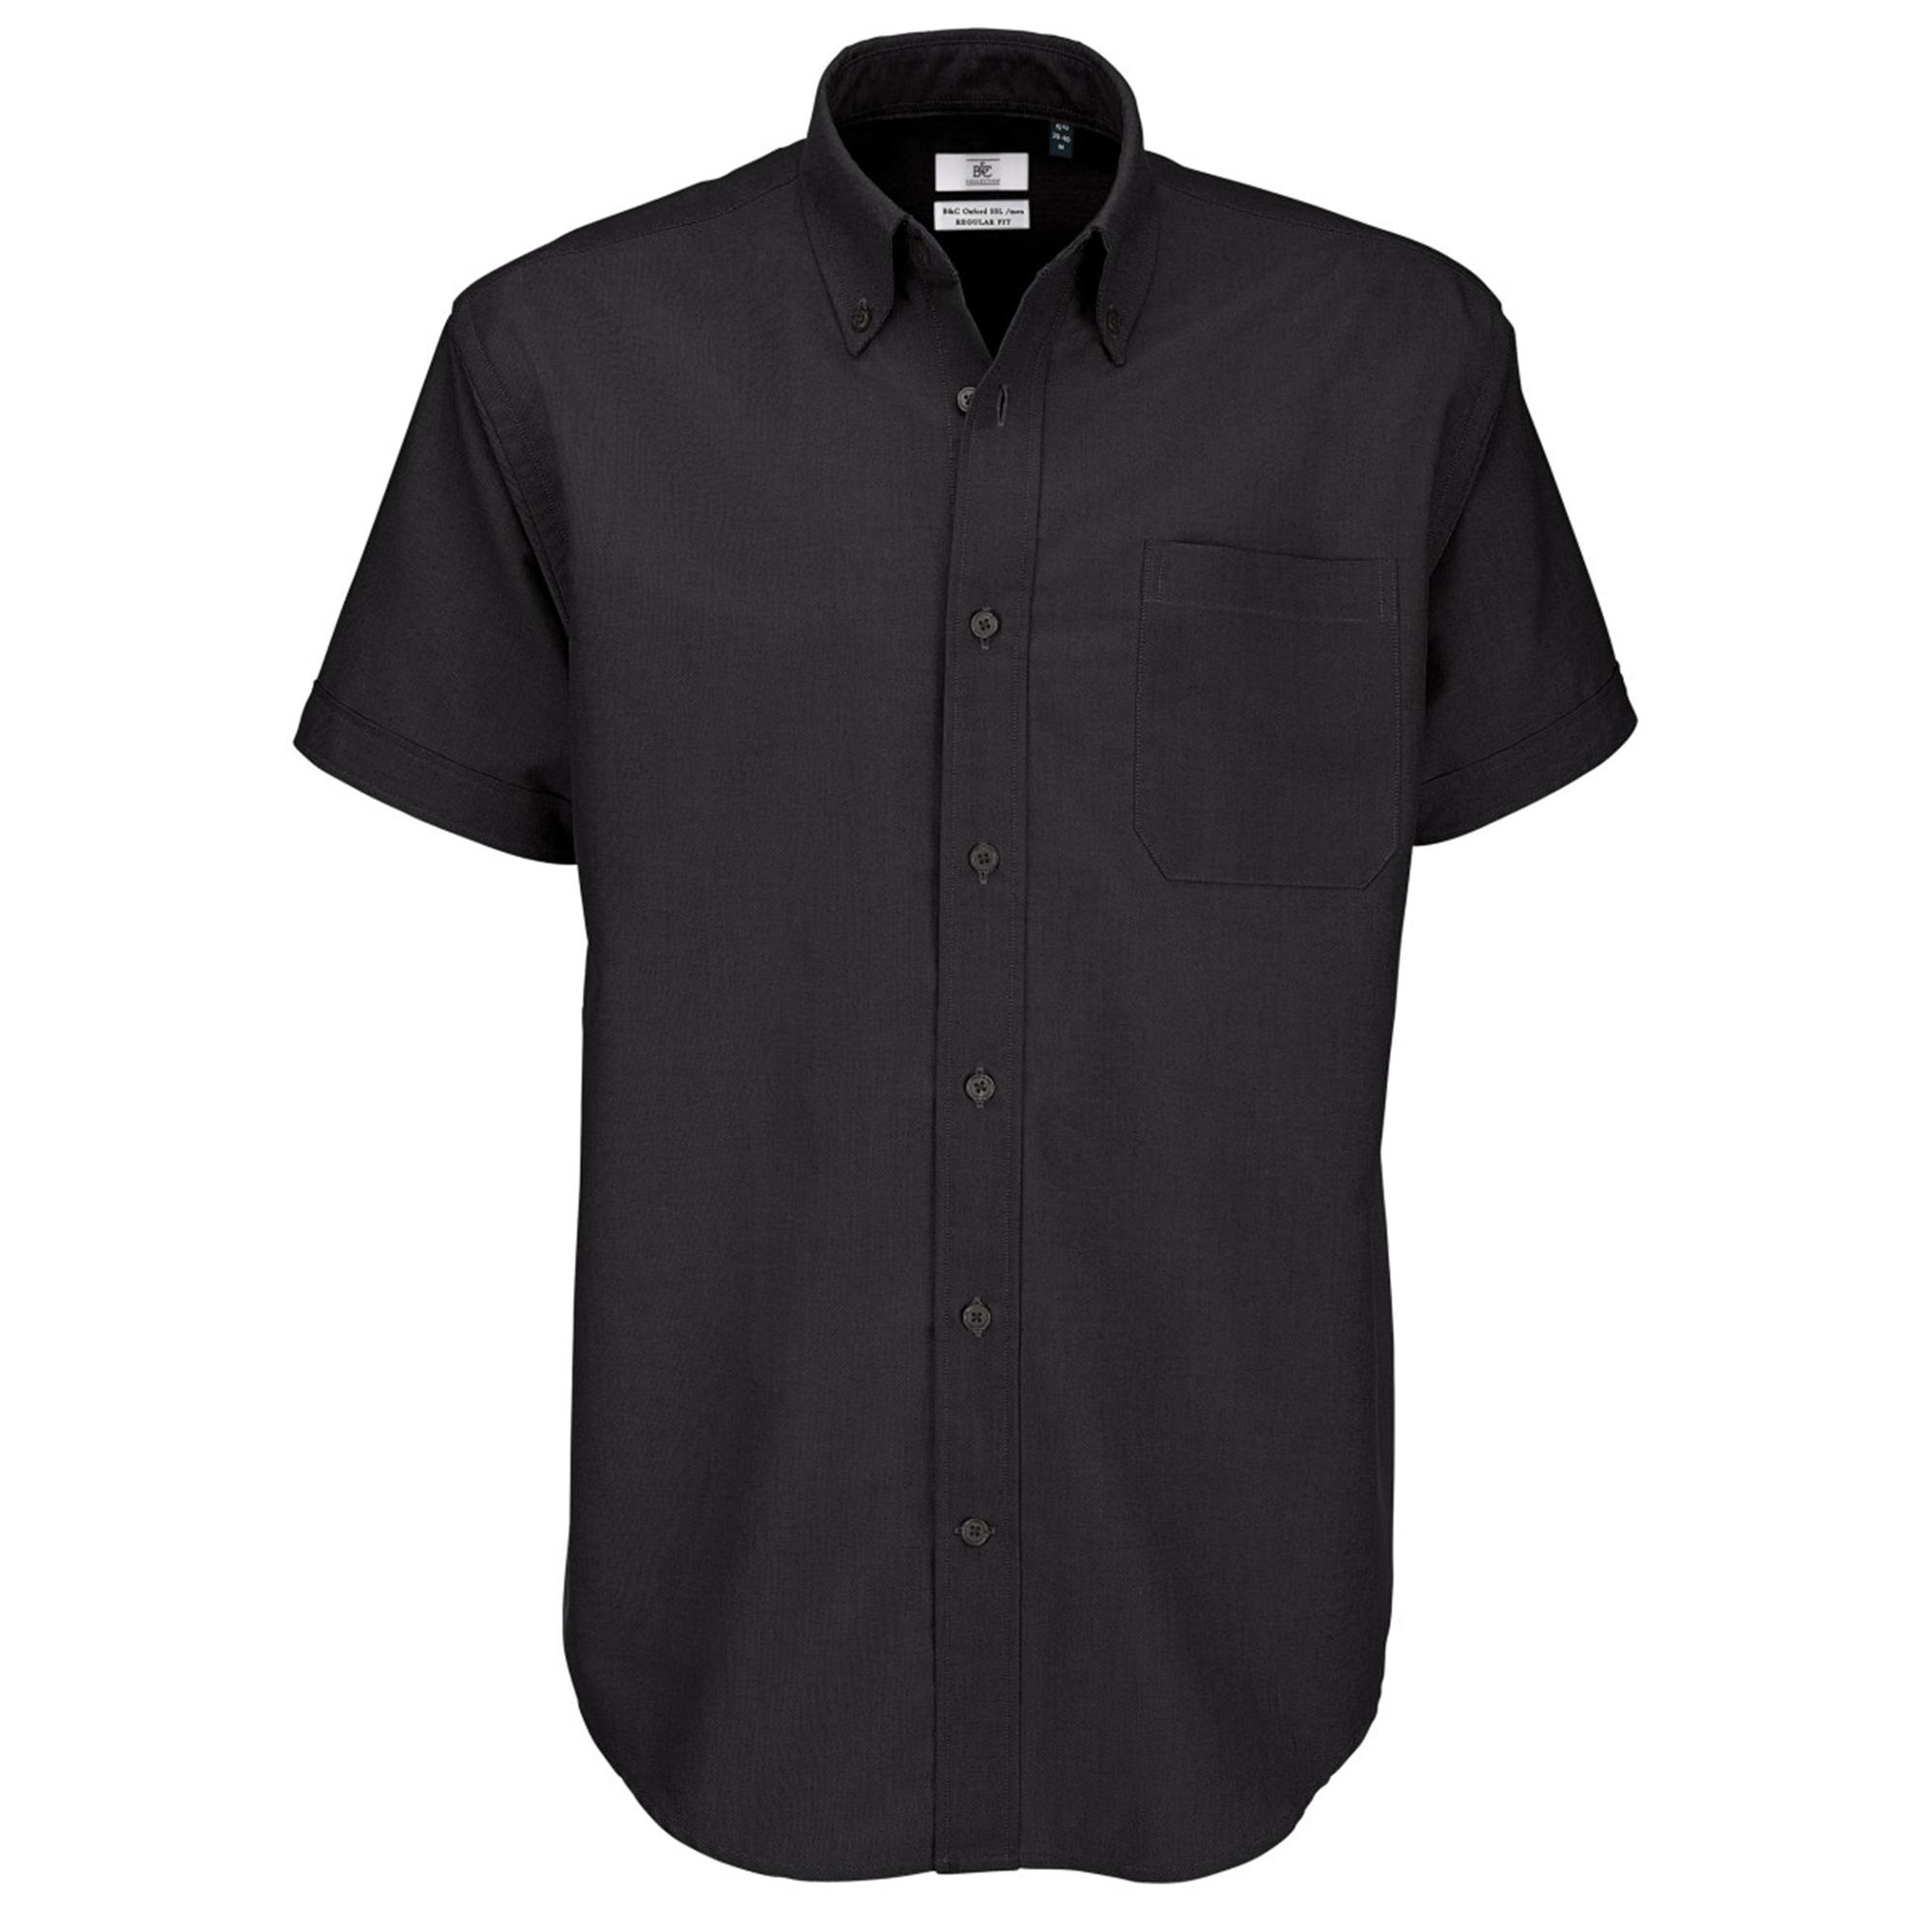 B&C Mens Oxford Short Sleeve Shirt / Mens Shirts (S) (Black)